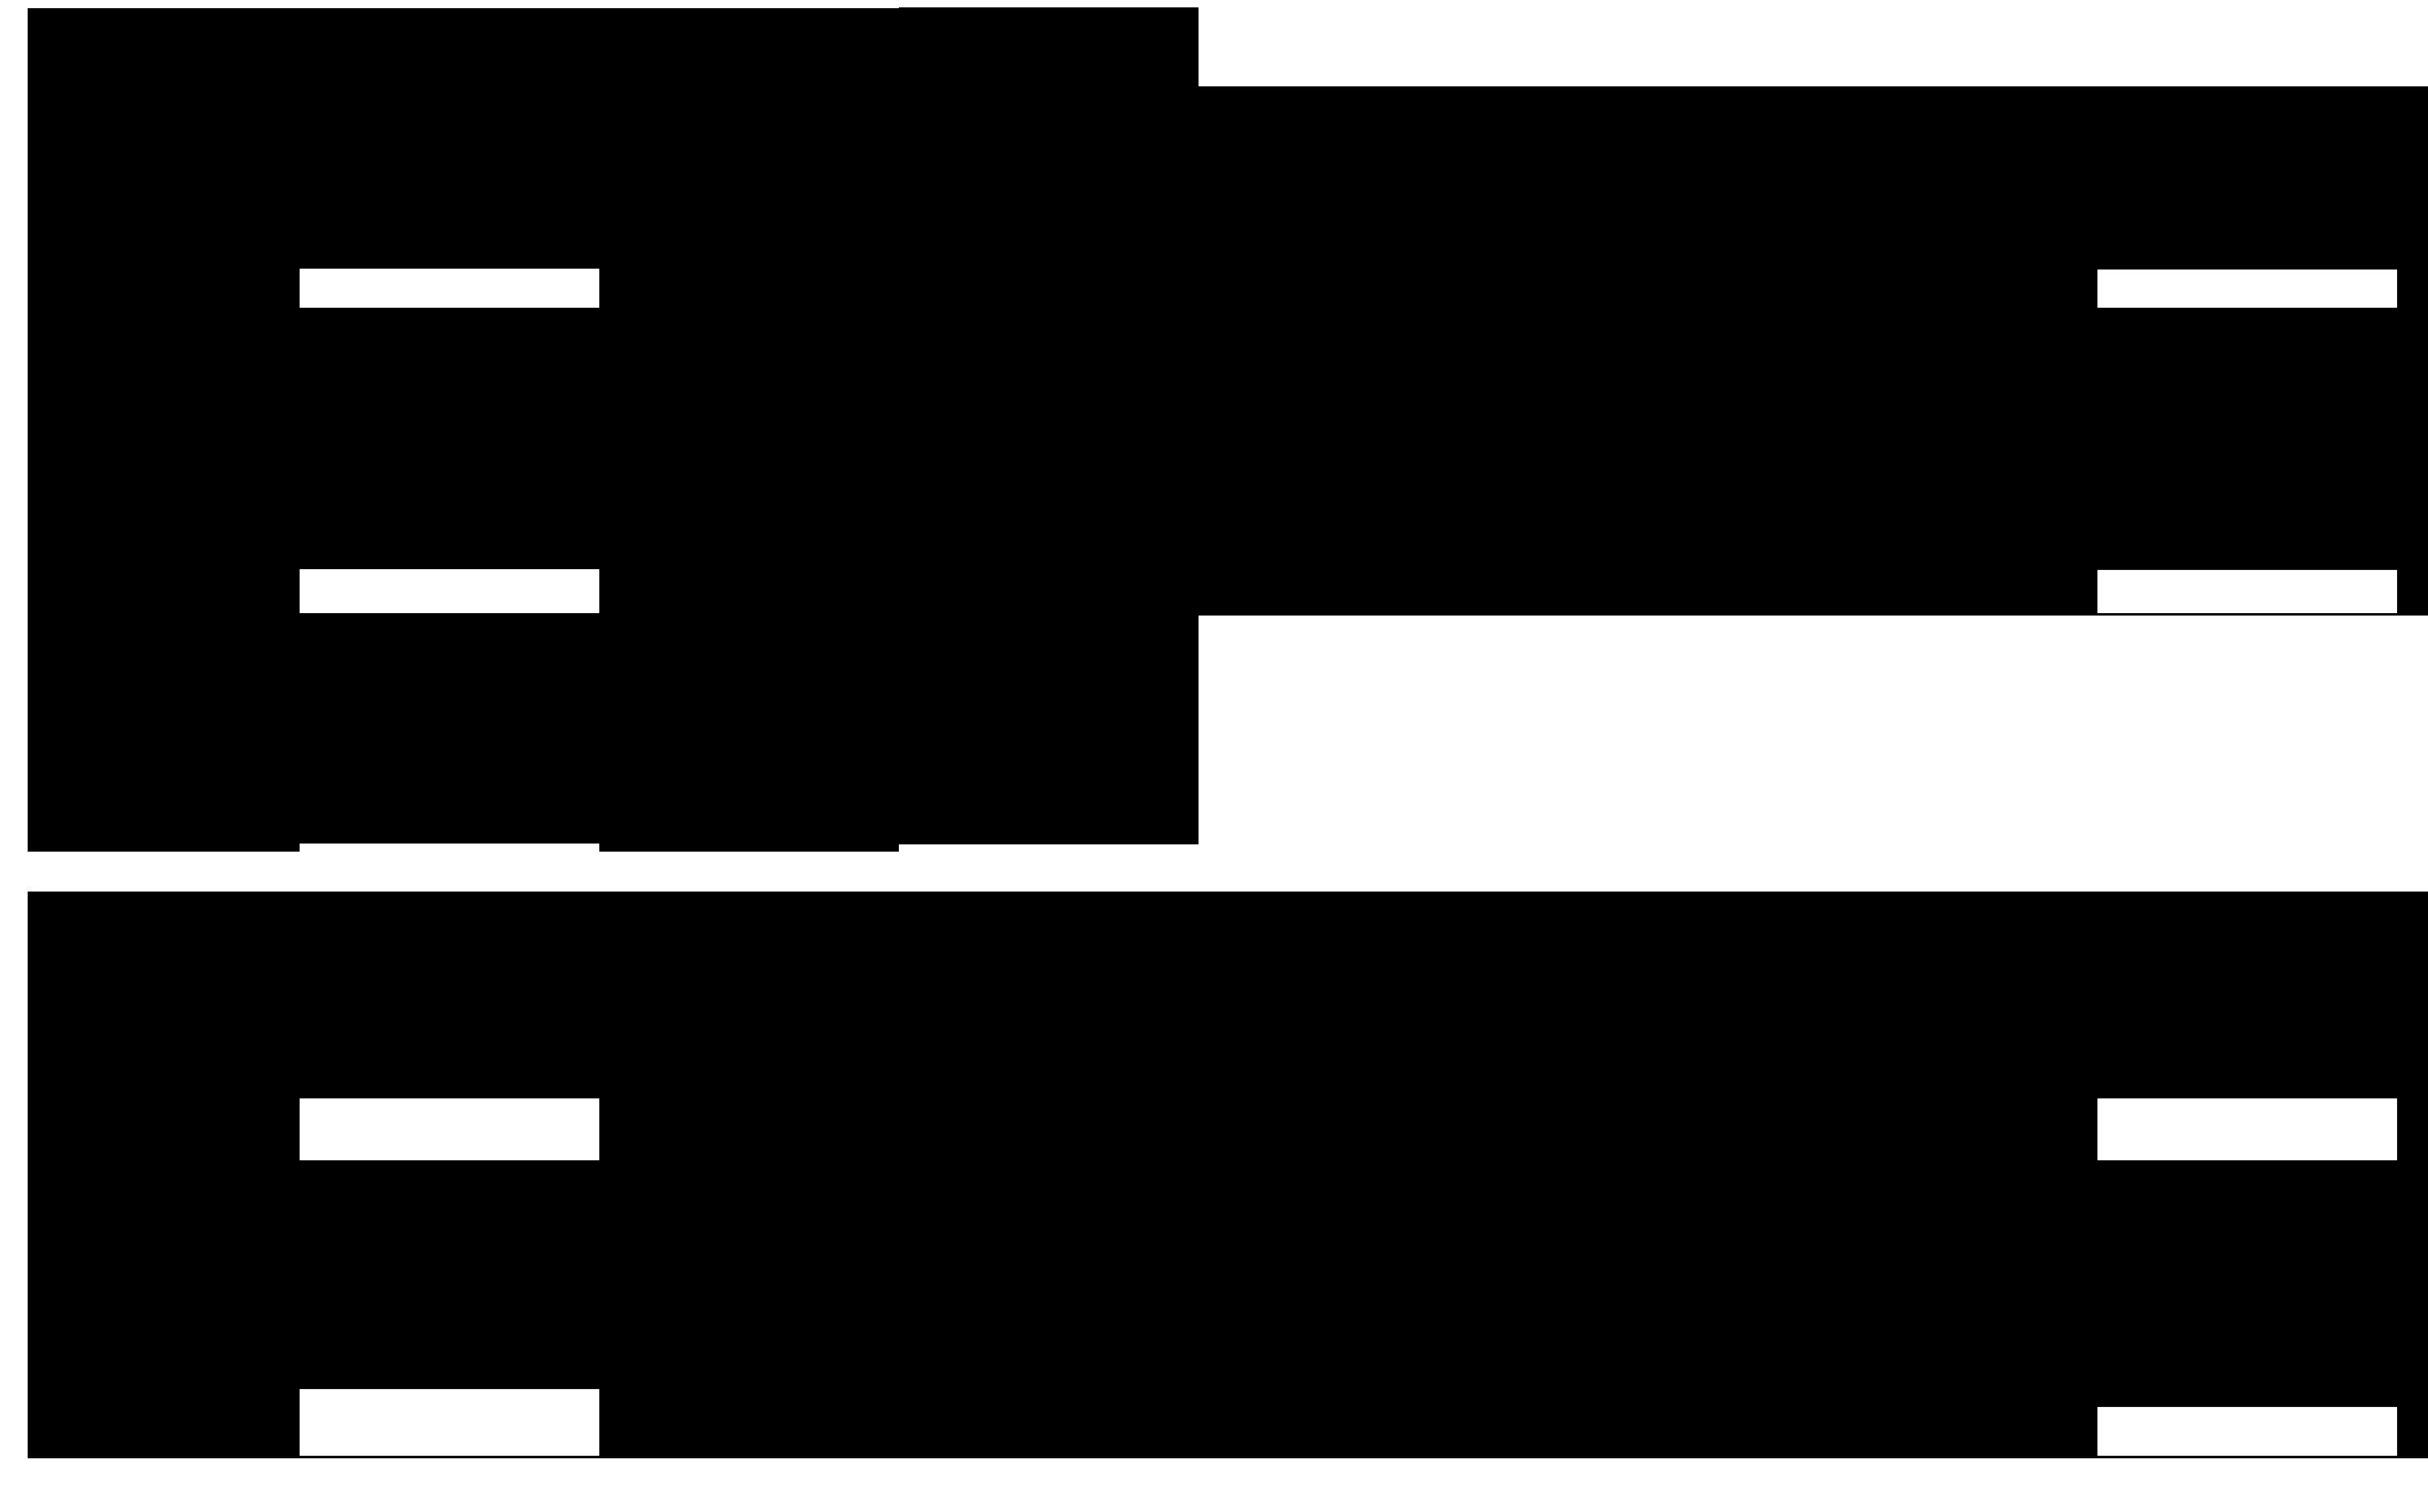 karsilastirma-tablosu-4